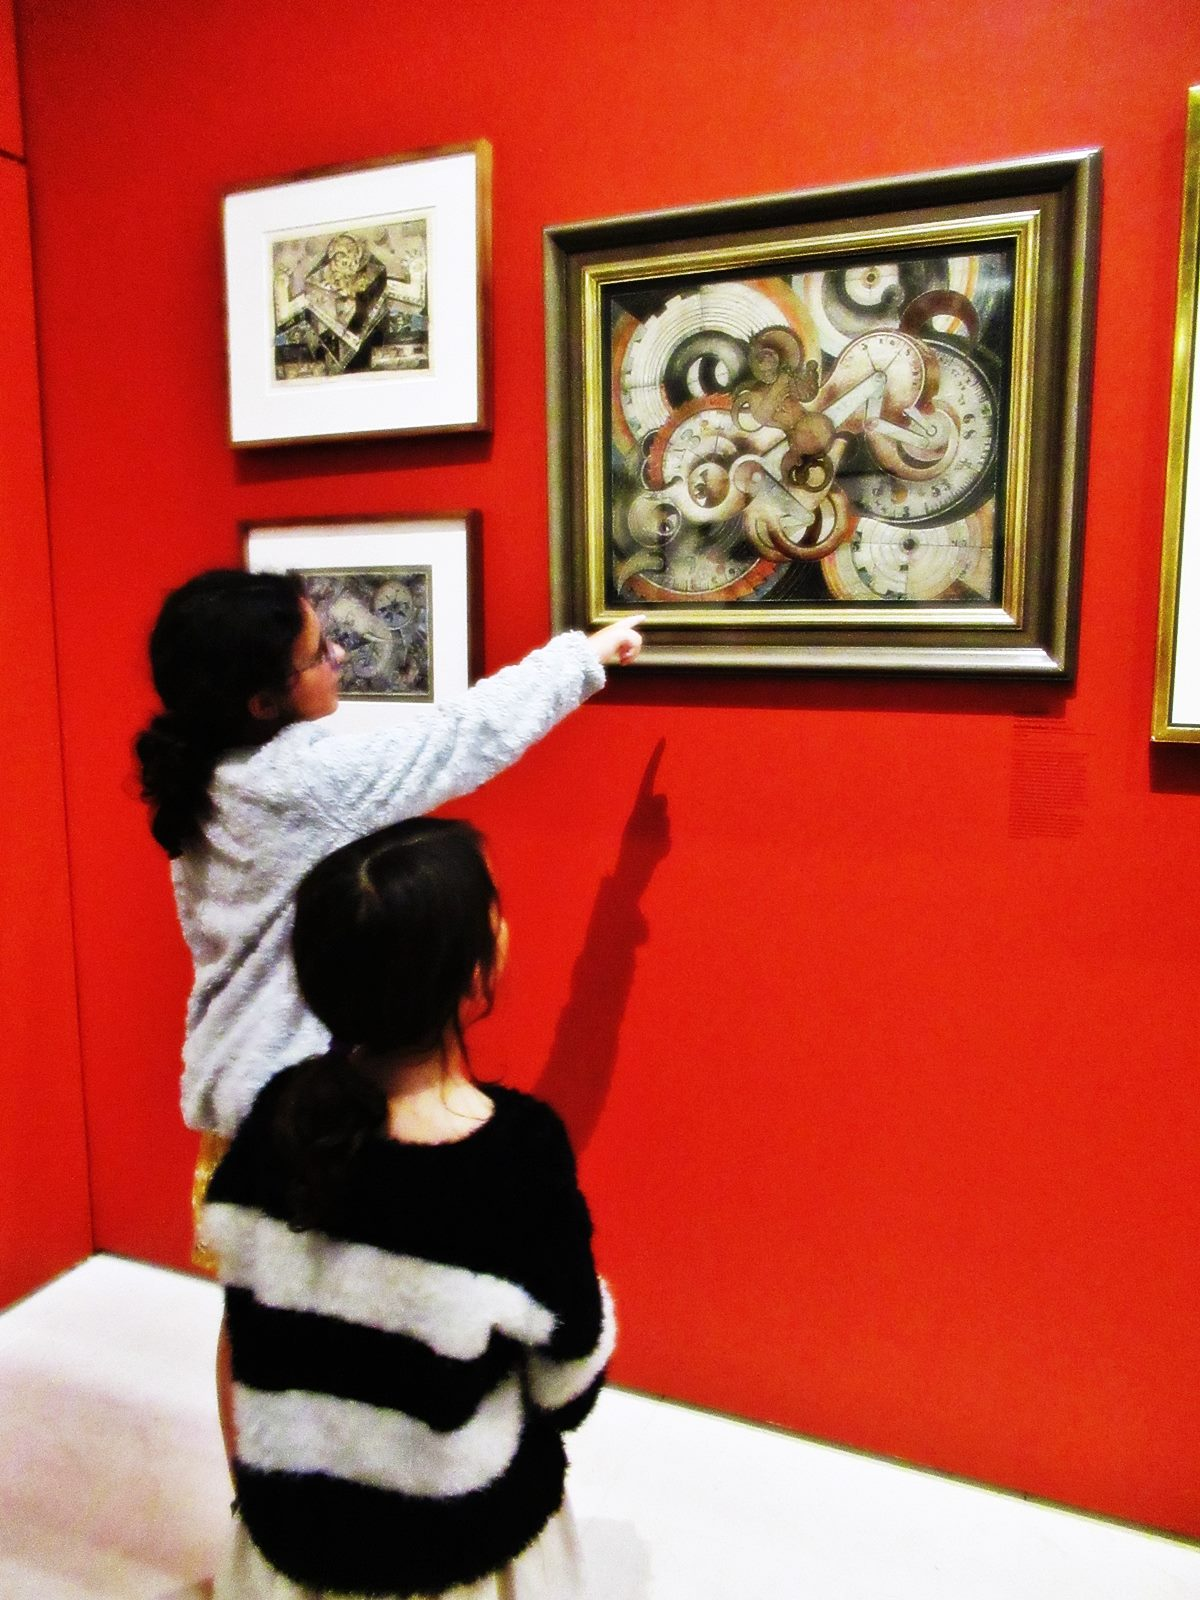 Exposition charlie chaplin nantes museeexposition charlie chaplin nantes 1